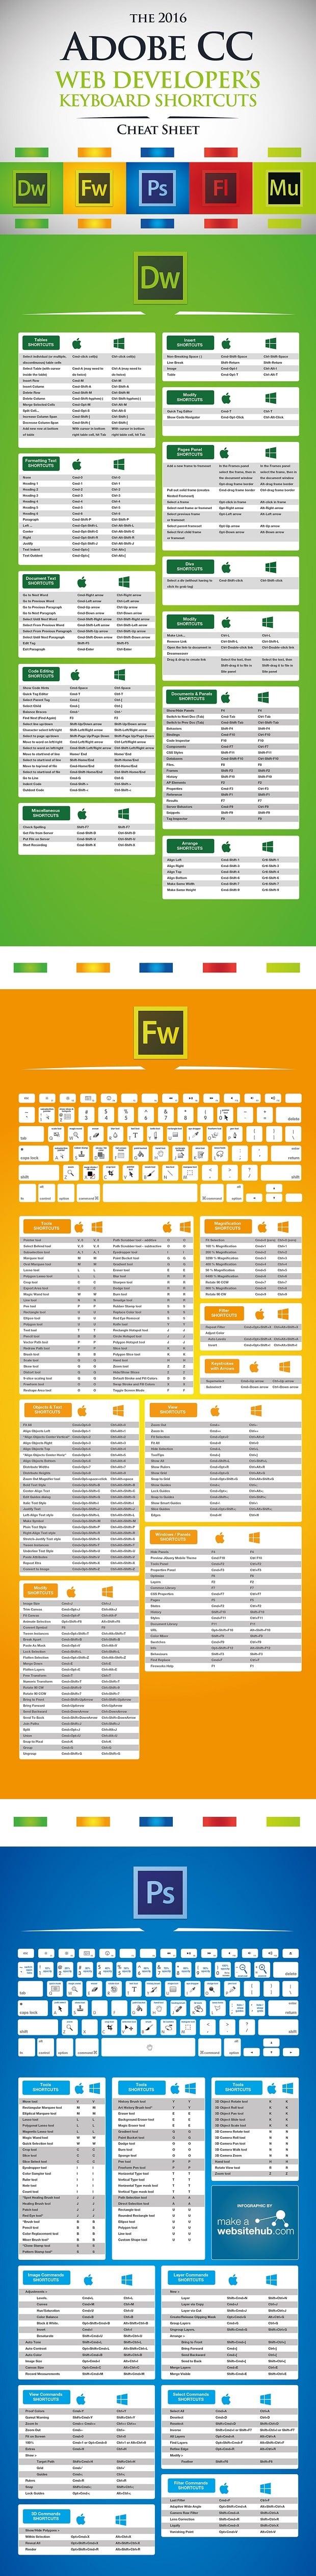 Cheat Sheets for Web Designers - web developer's cheat sheet